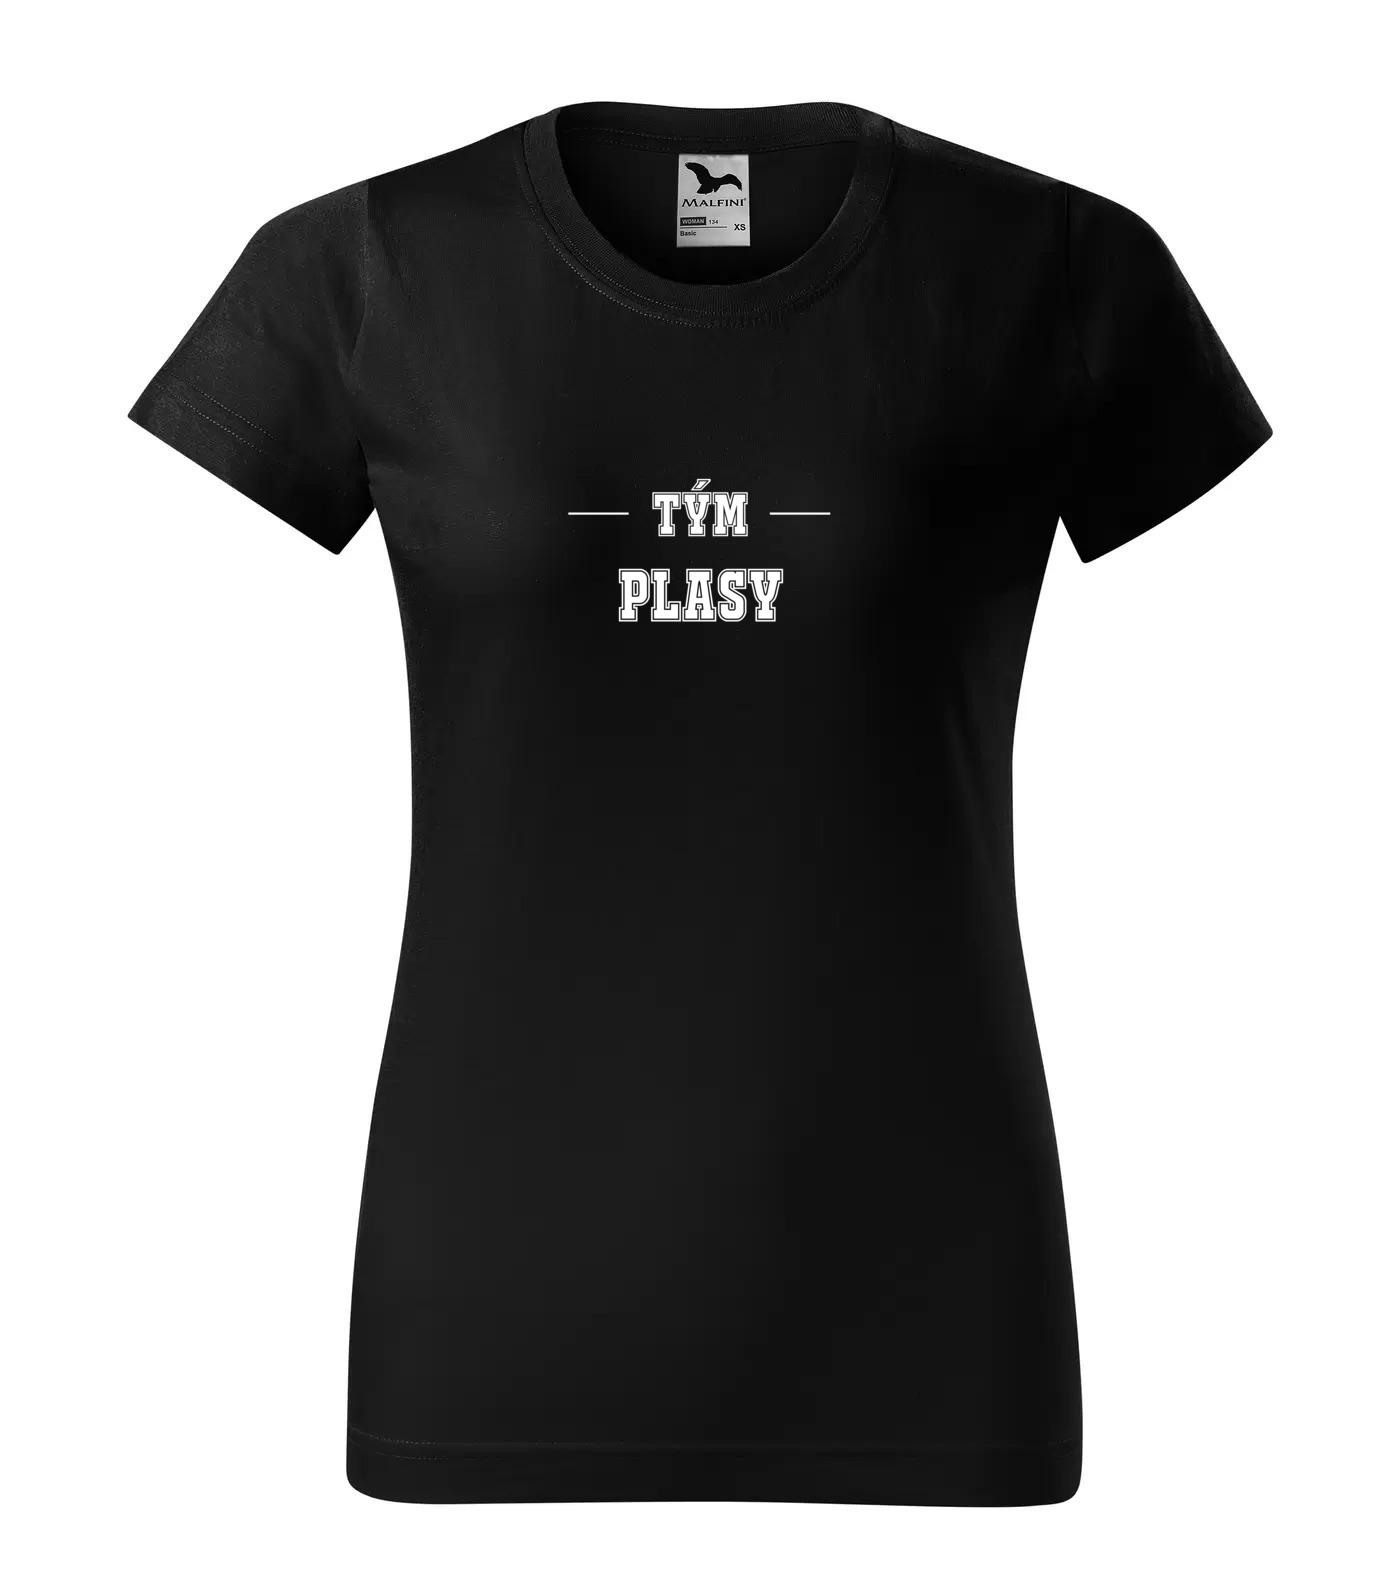 Tričko Plasy